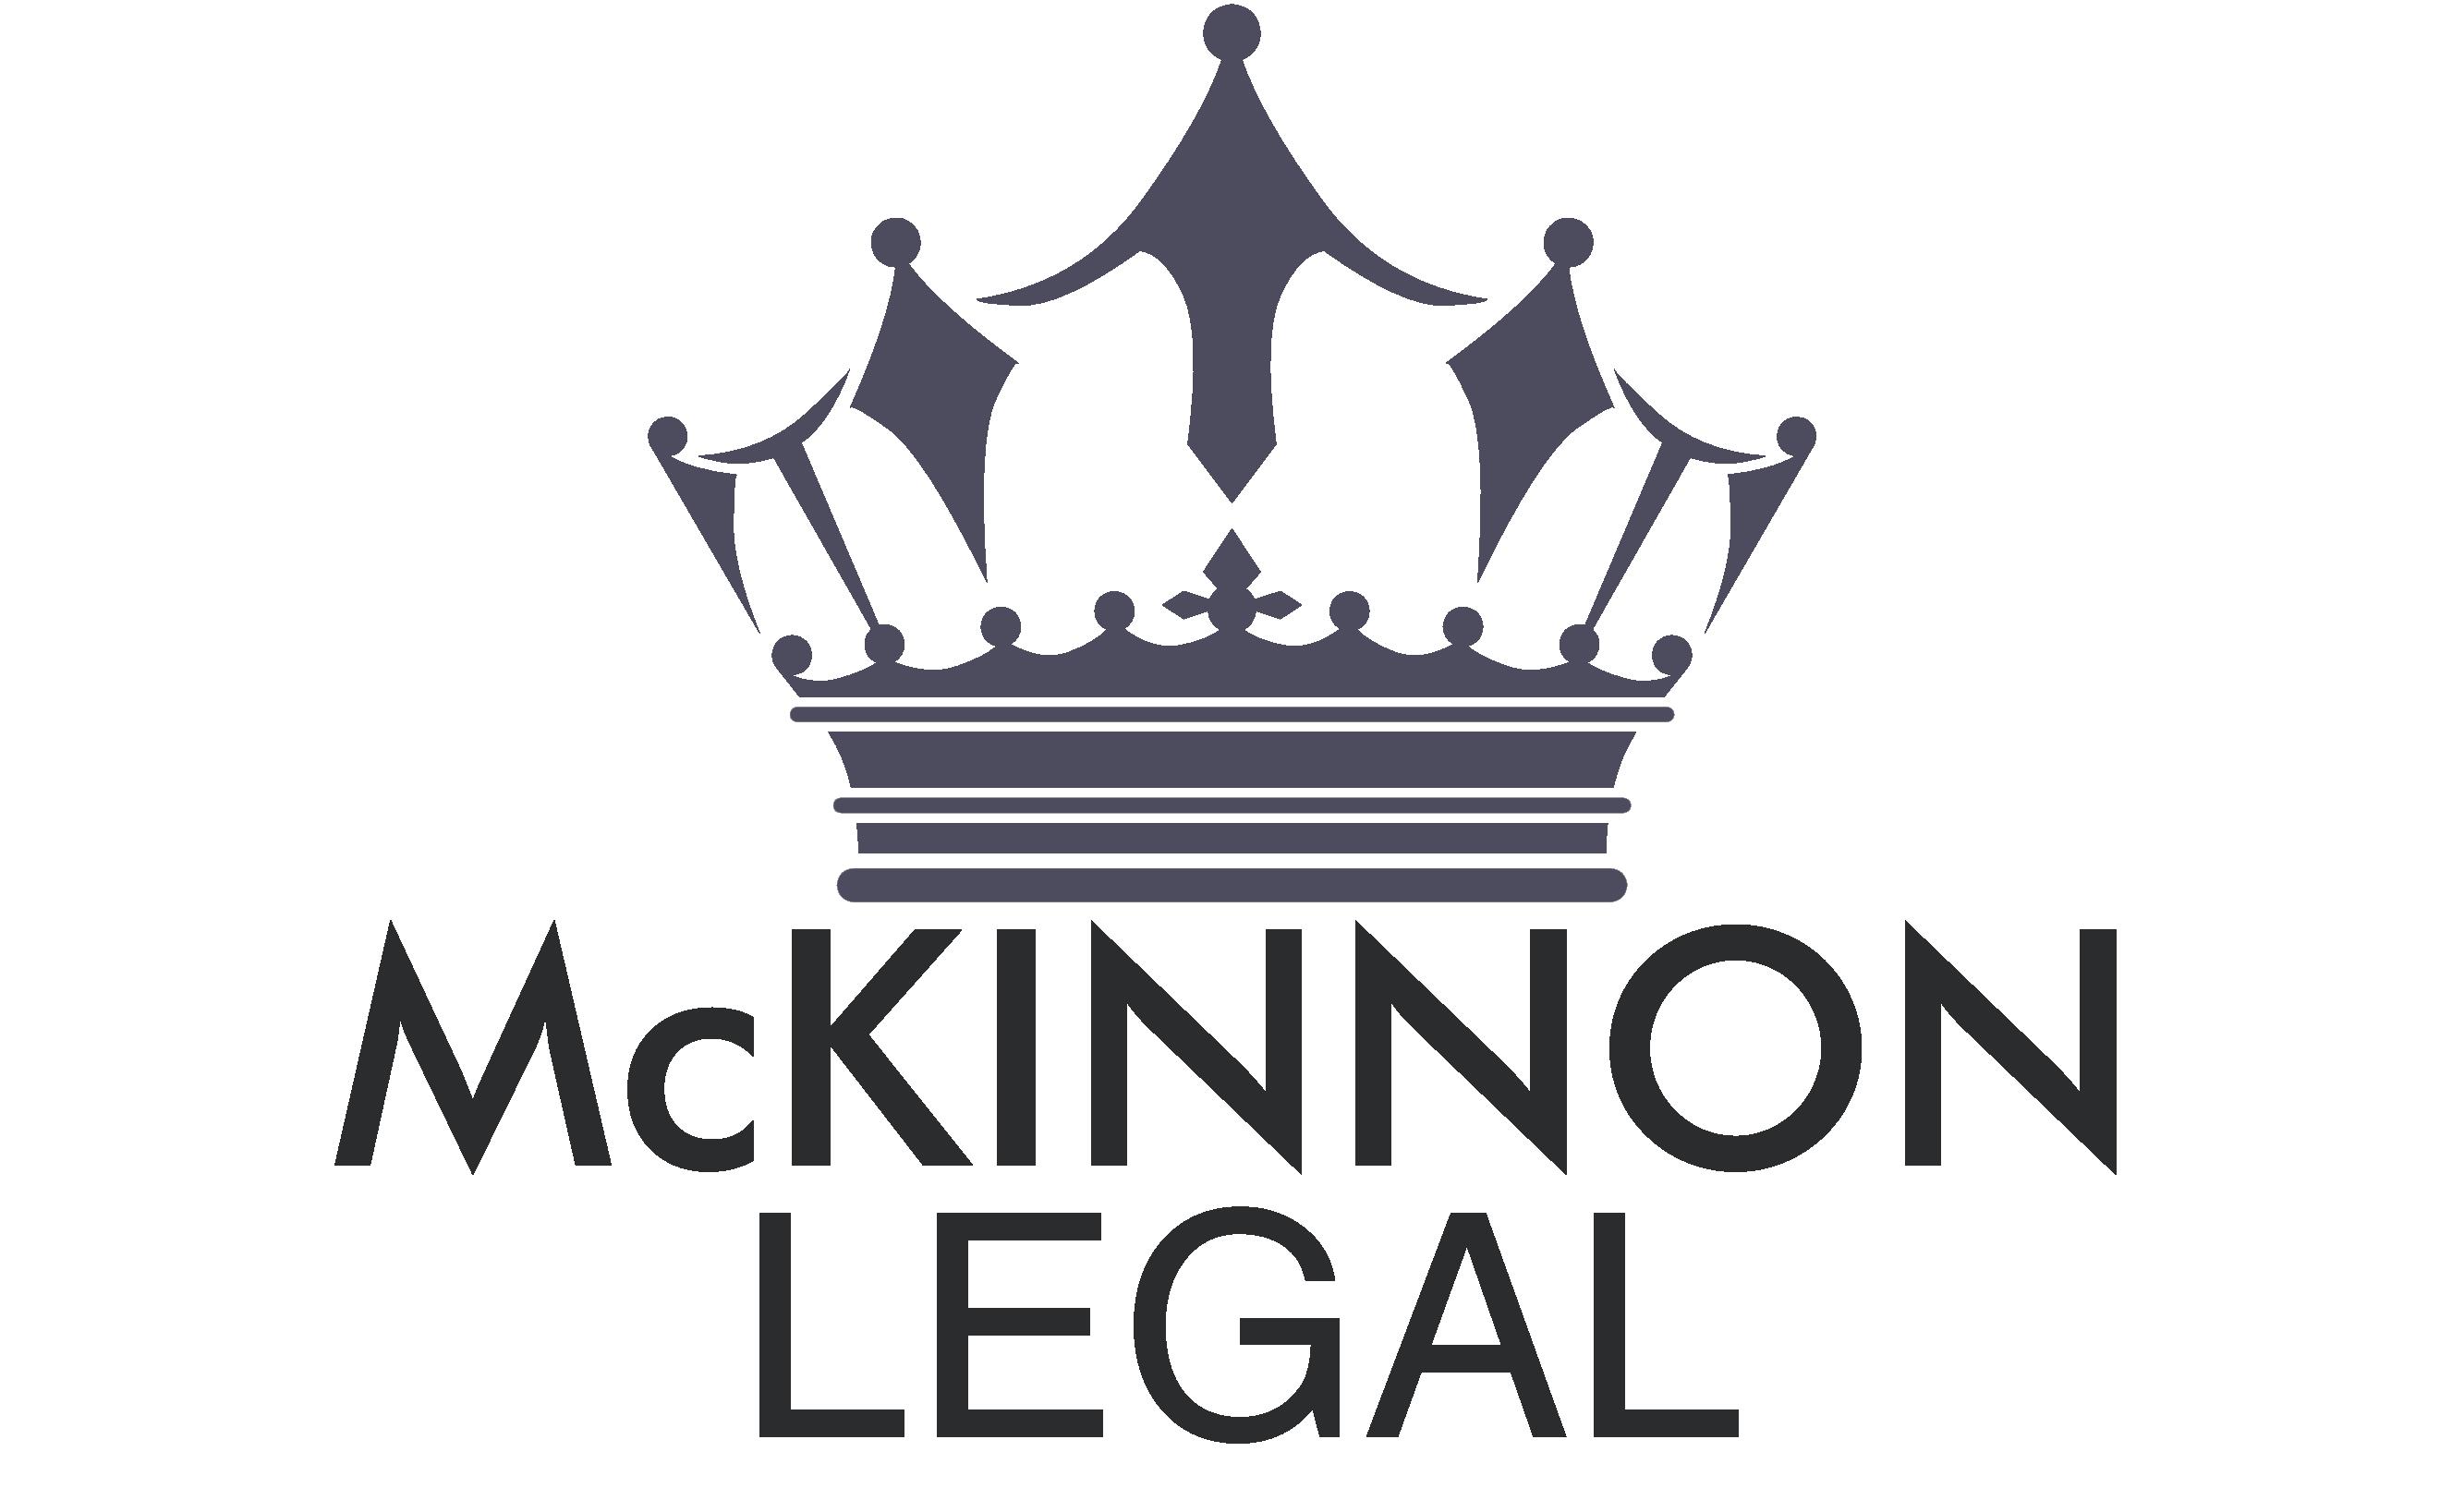 McKinnon Legal logo